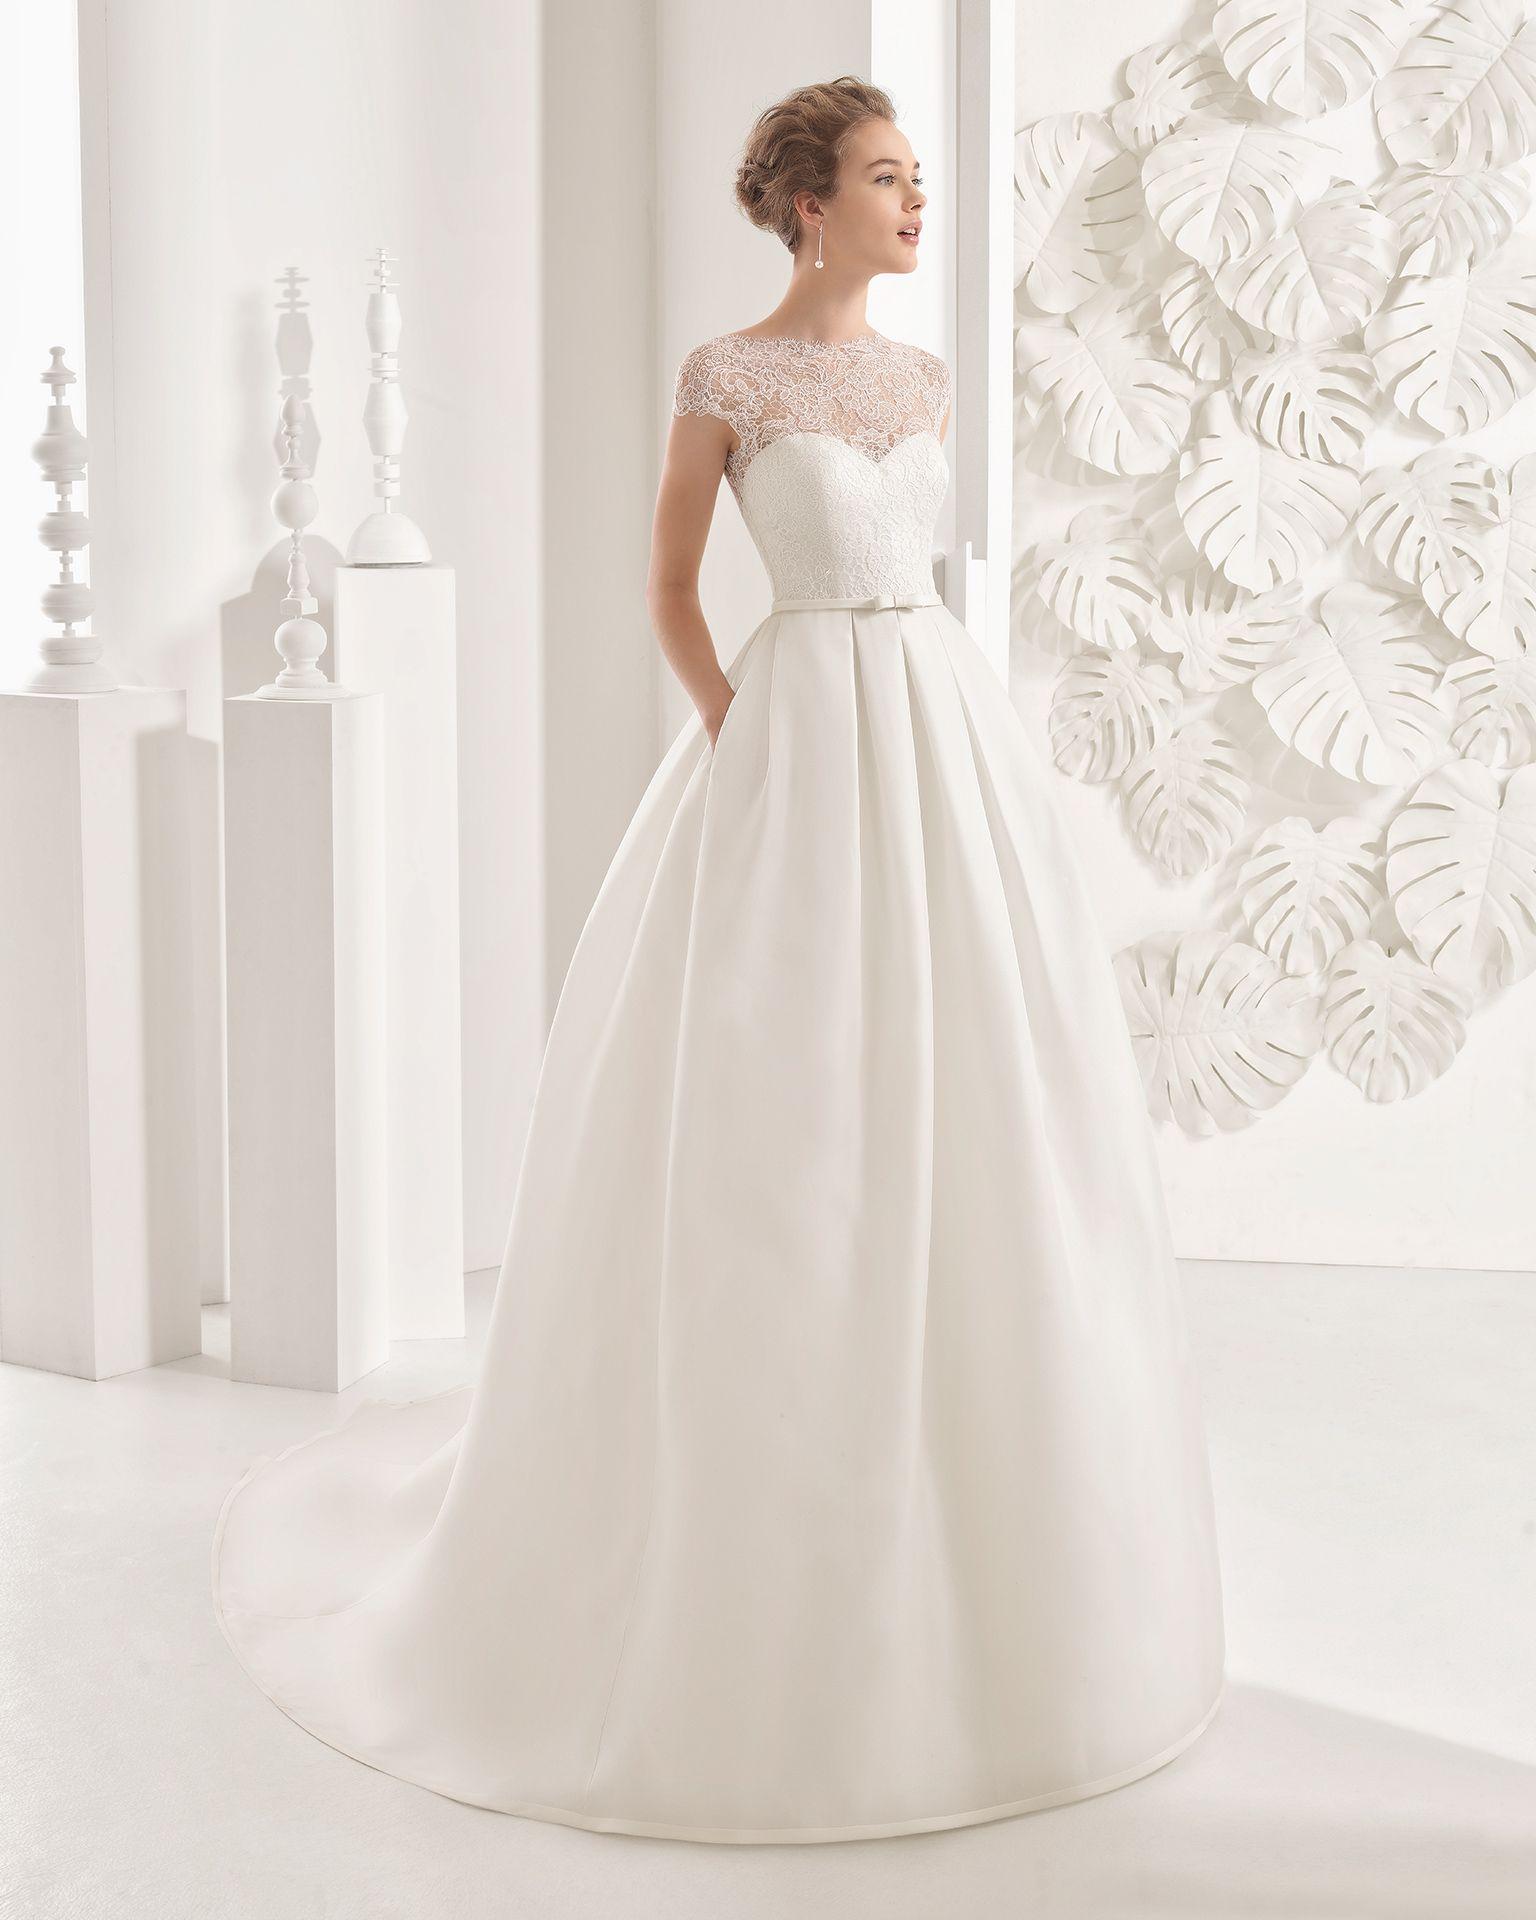 Naolin Hochzeit 2017 Rosa Clará Kollektion